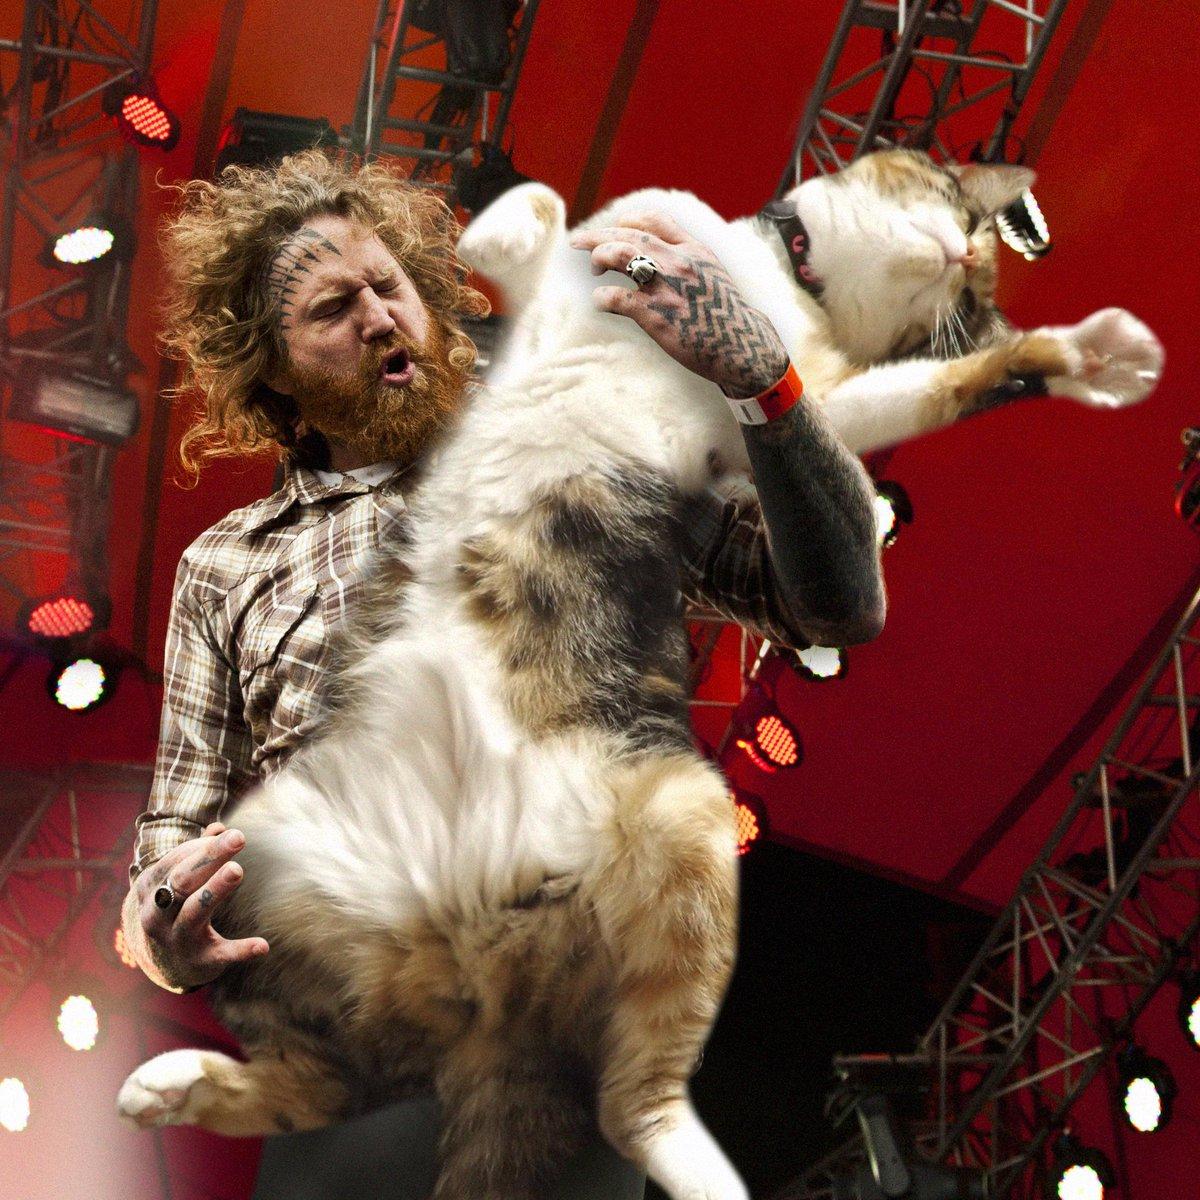 #mastocat http://t.co/u2mx9ktFeu